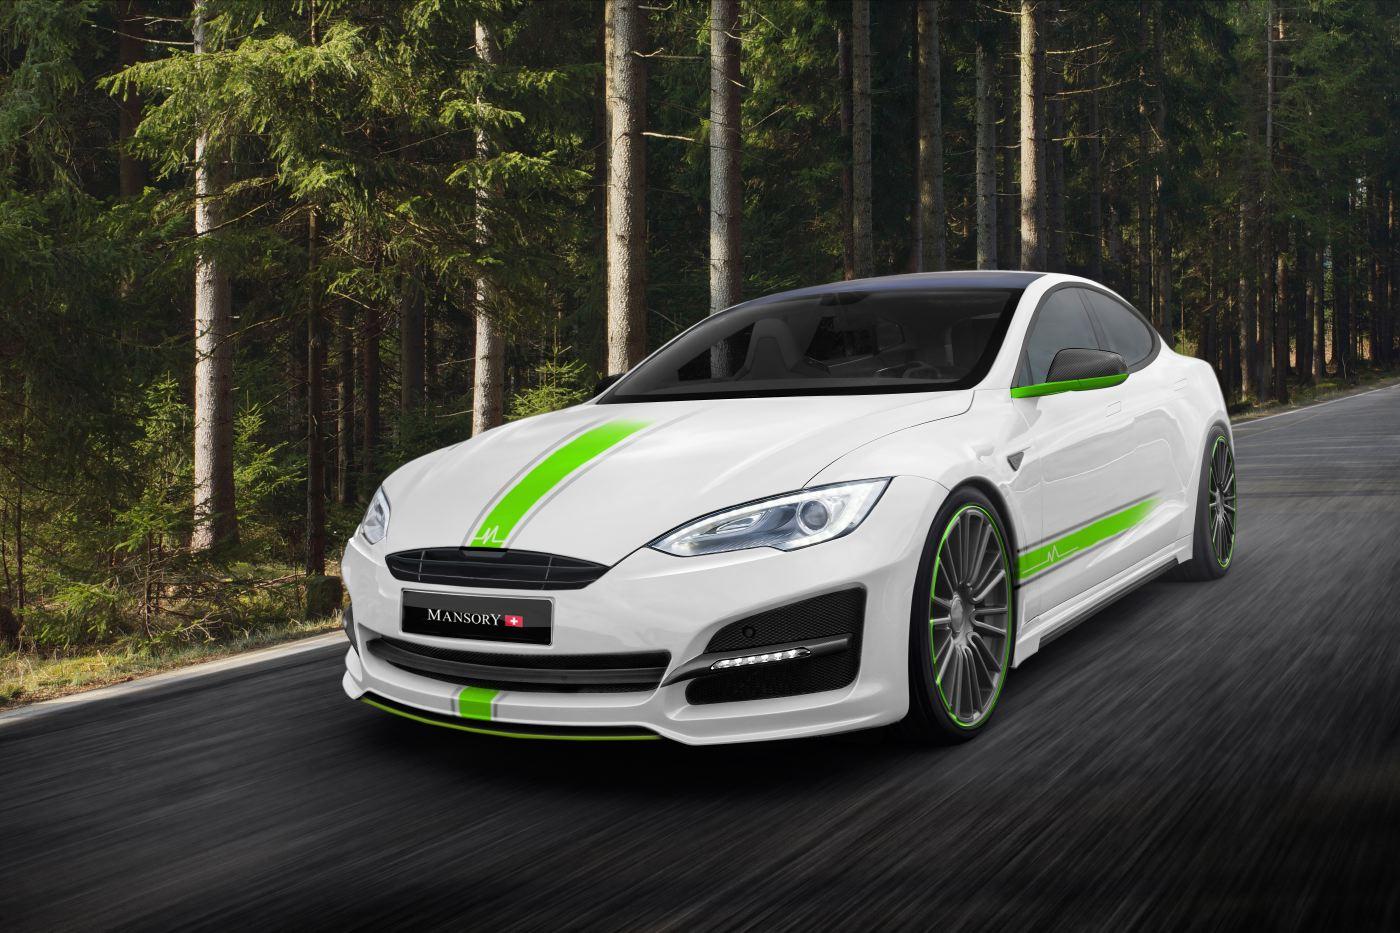 Mansory To Present Tesla Model S Tuning Kit In Frankfurt